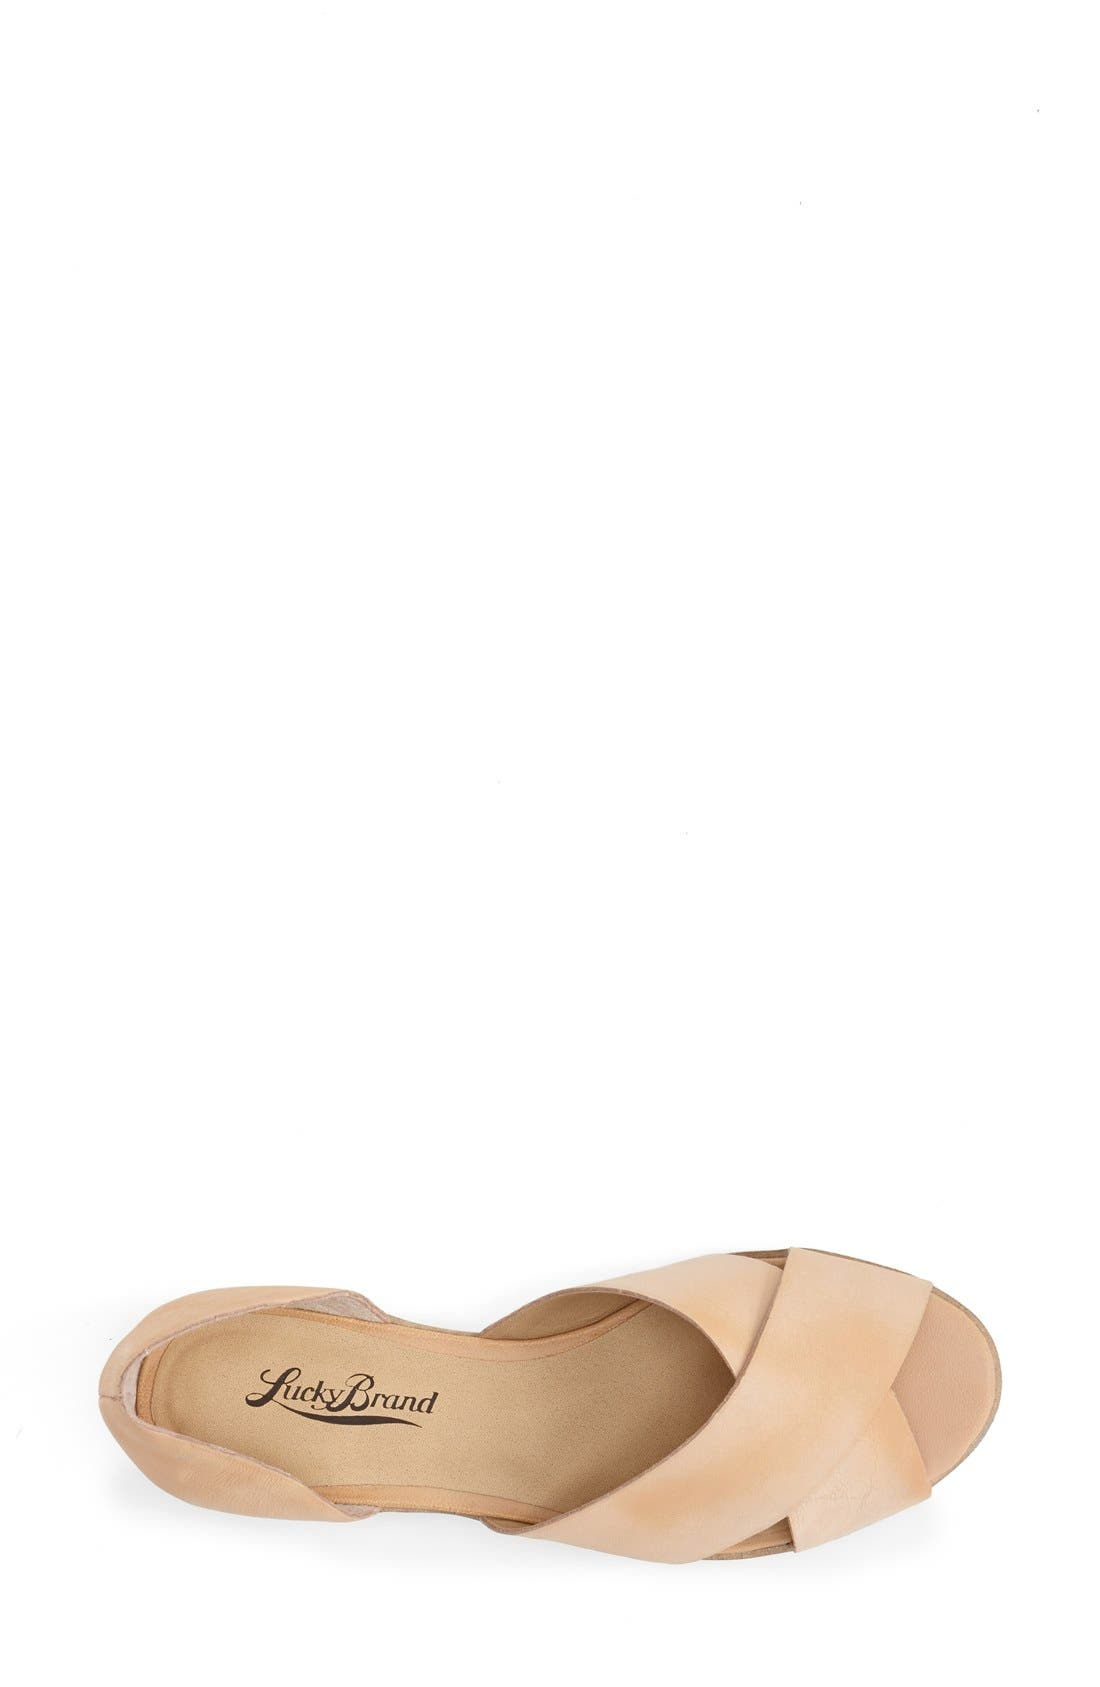 Alternate Image 3  - Lucky Brand 'Silla' Leather Cross Strap Sandal (Women)